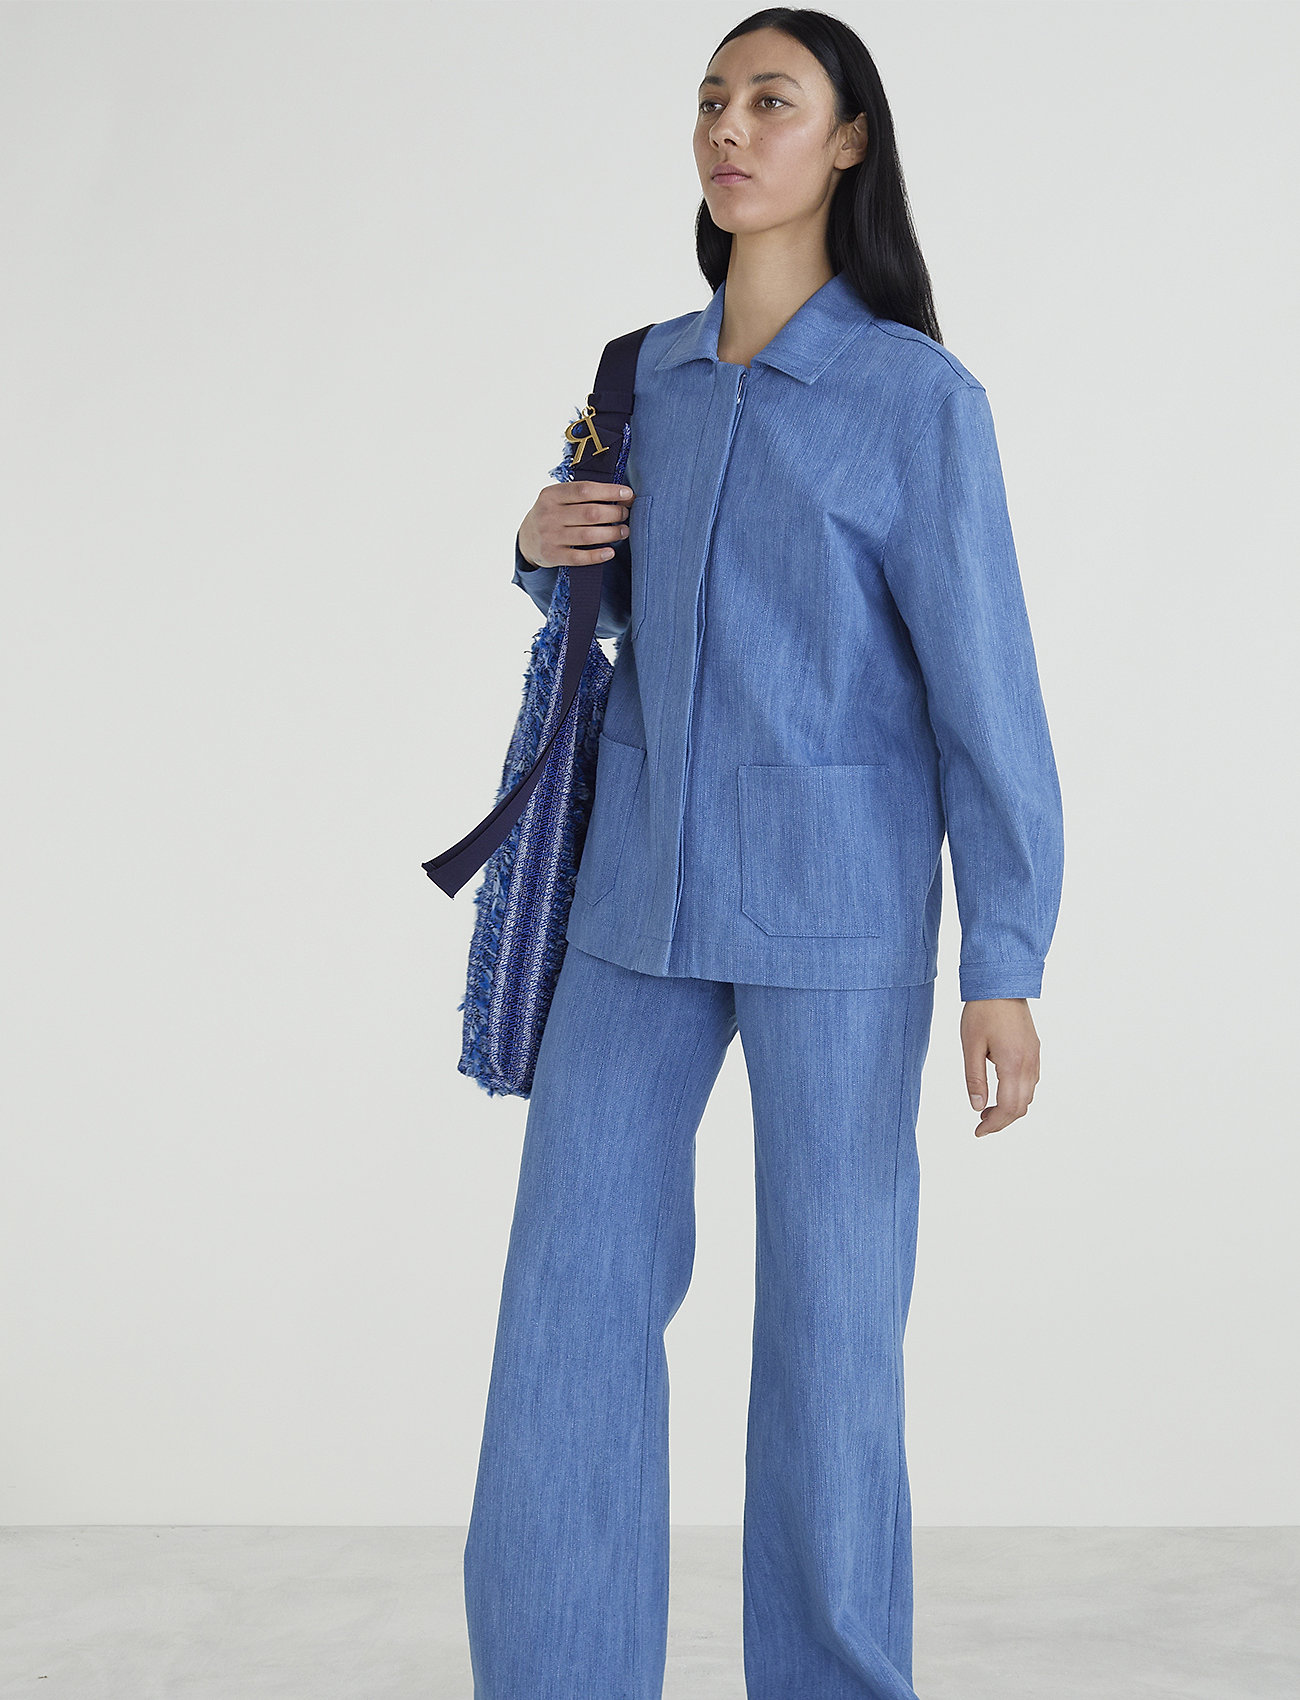 RODEBJER - PEACE WORKWEAR - leveälahkeiset housut - denim blue - 0